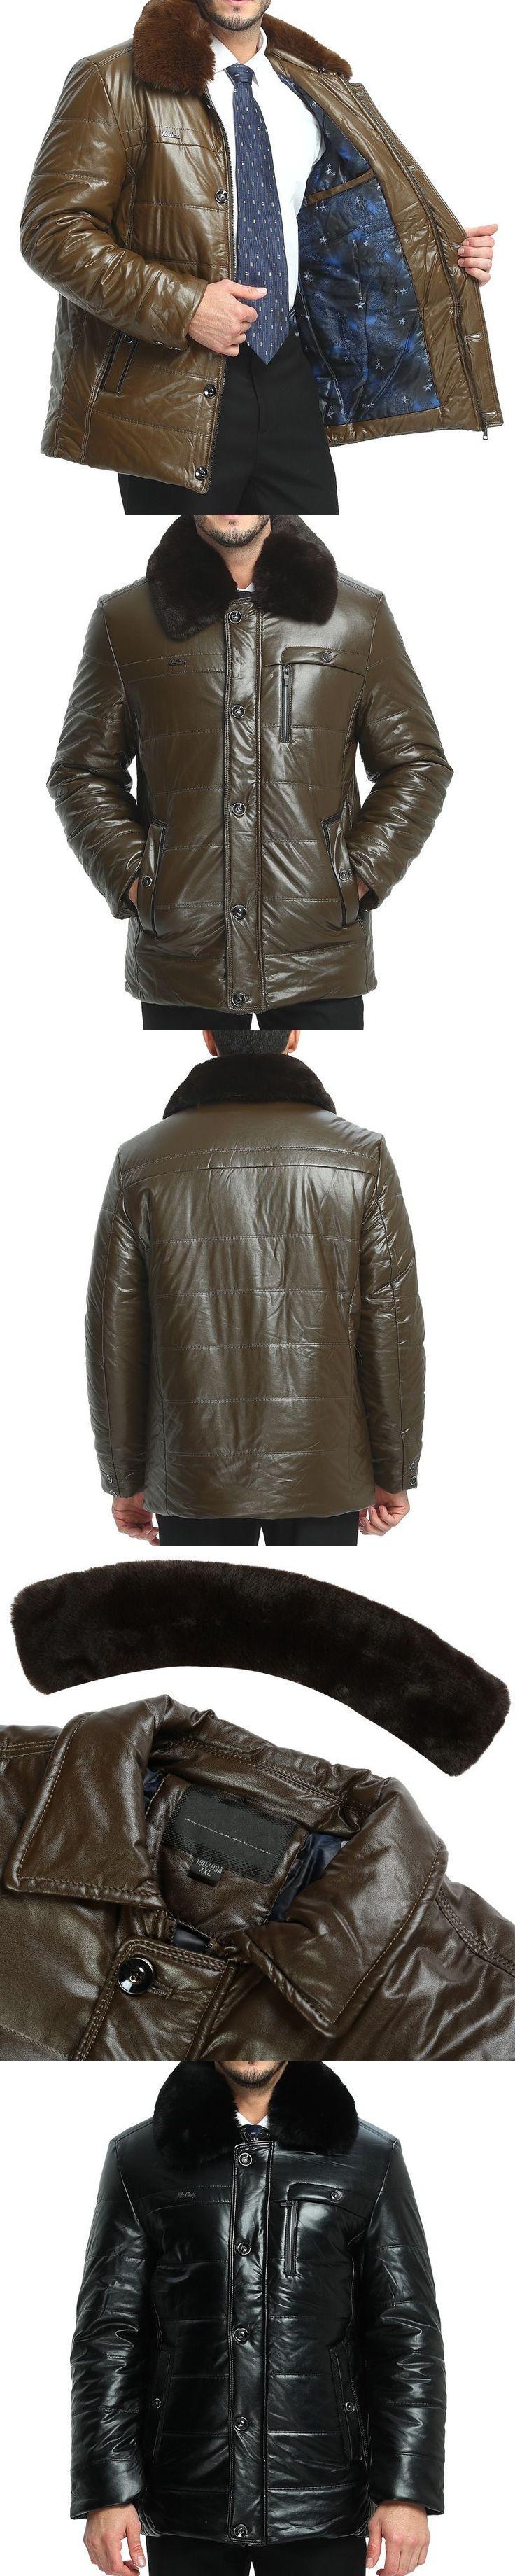 ZEESHANT Leather Jacket Men's Casual Fashion Jackets Lapel Black and Brown Zipper Faux Fur Men Coat 3XL 5XL Jaqueta De Couro #mensjackets